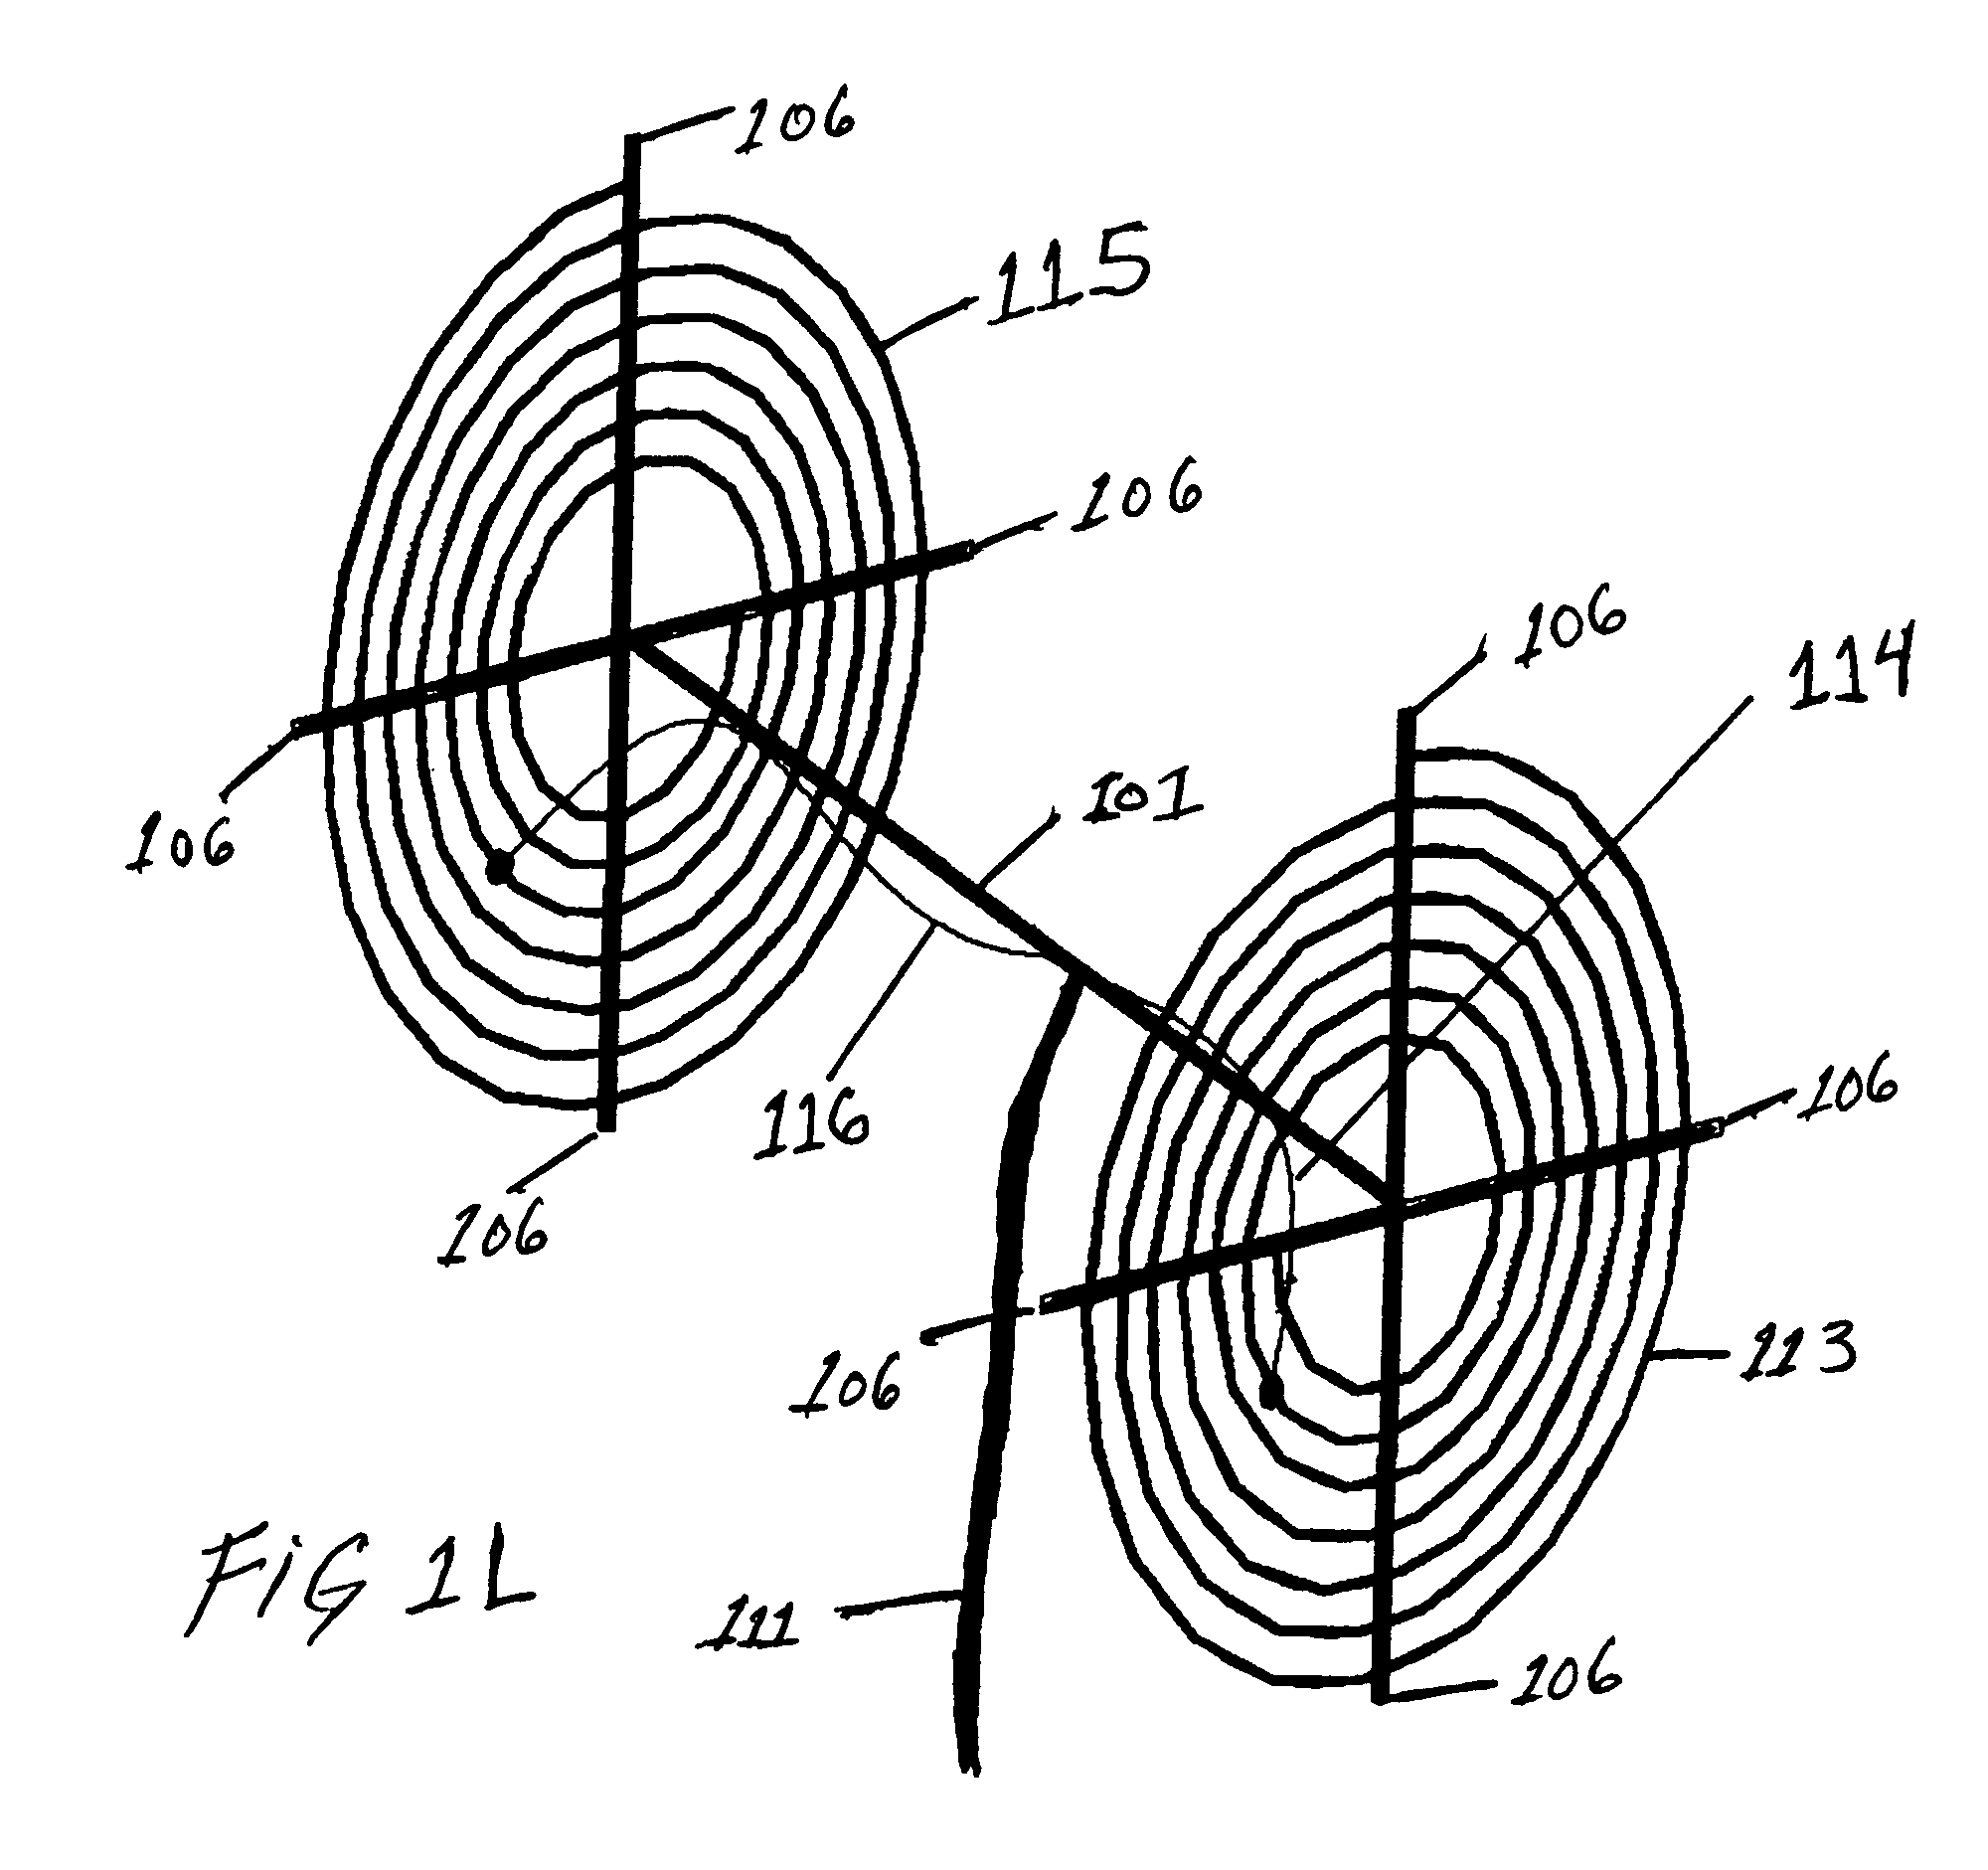 US07586462 20090908 D00008?resize\\\\\\\\\\\\\\\=665%2C625 2000 exmark lazer z hp wiring diagram on 2000 download wirning exmark lazer z hp wiring diagram at alyssarenee.co